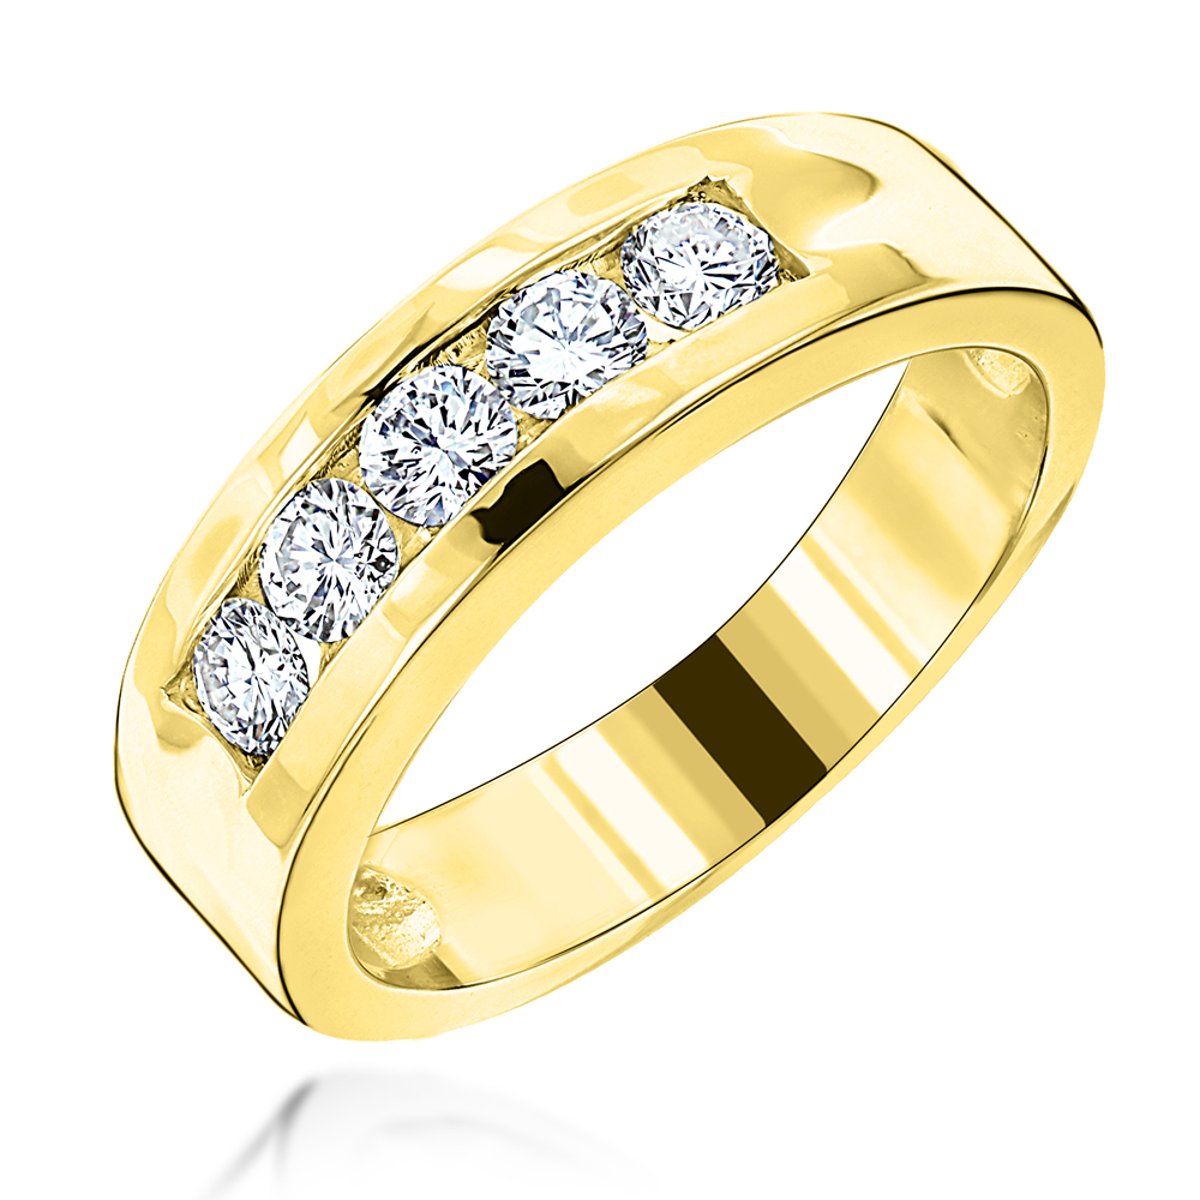 18K Gold Men's Diamond Wedding Ring 0.75ct